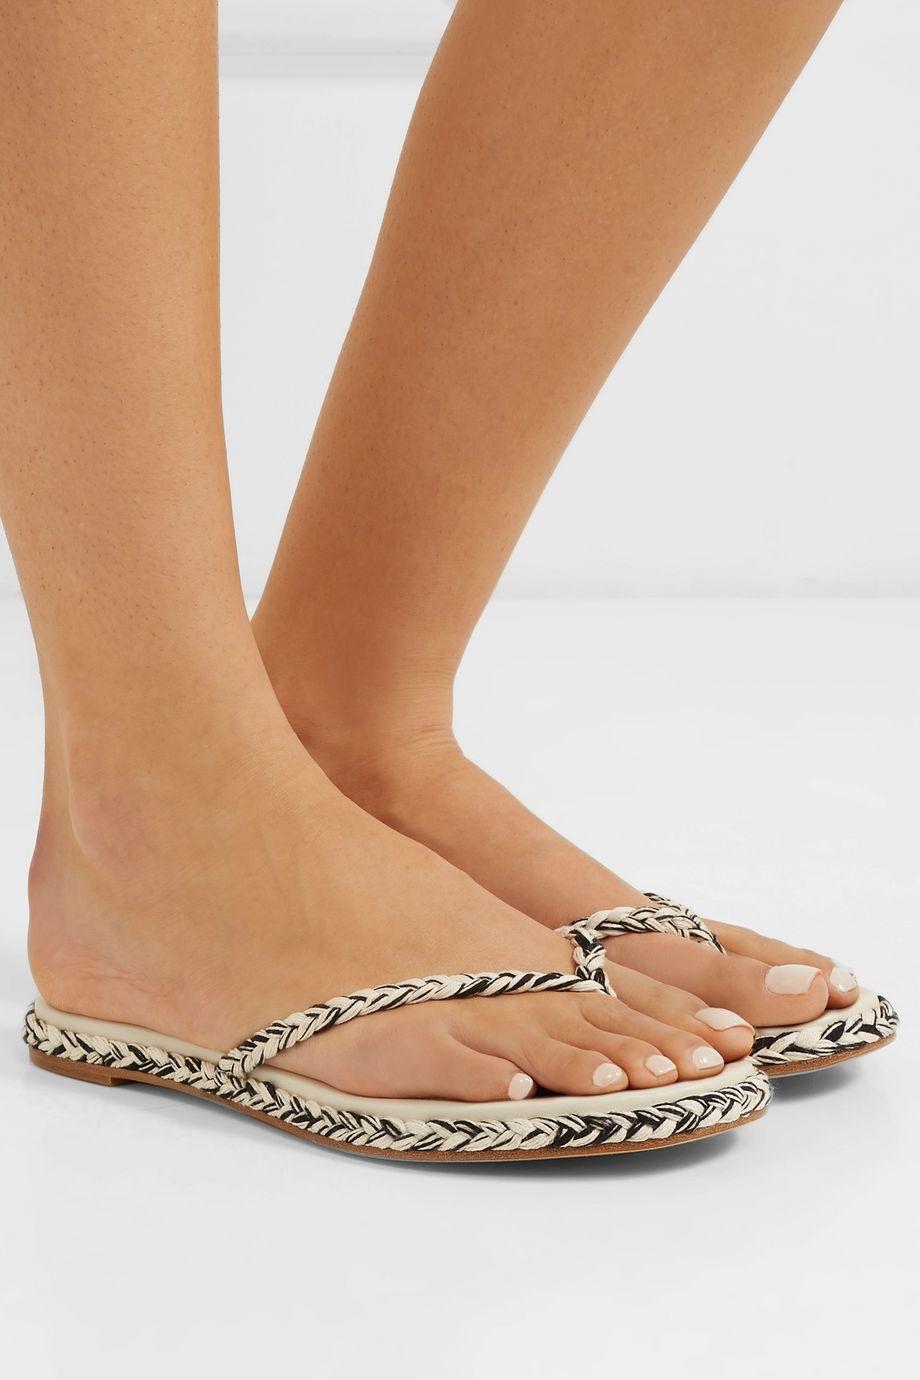 Antolina Boe braided cotton flip flops